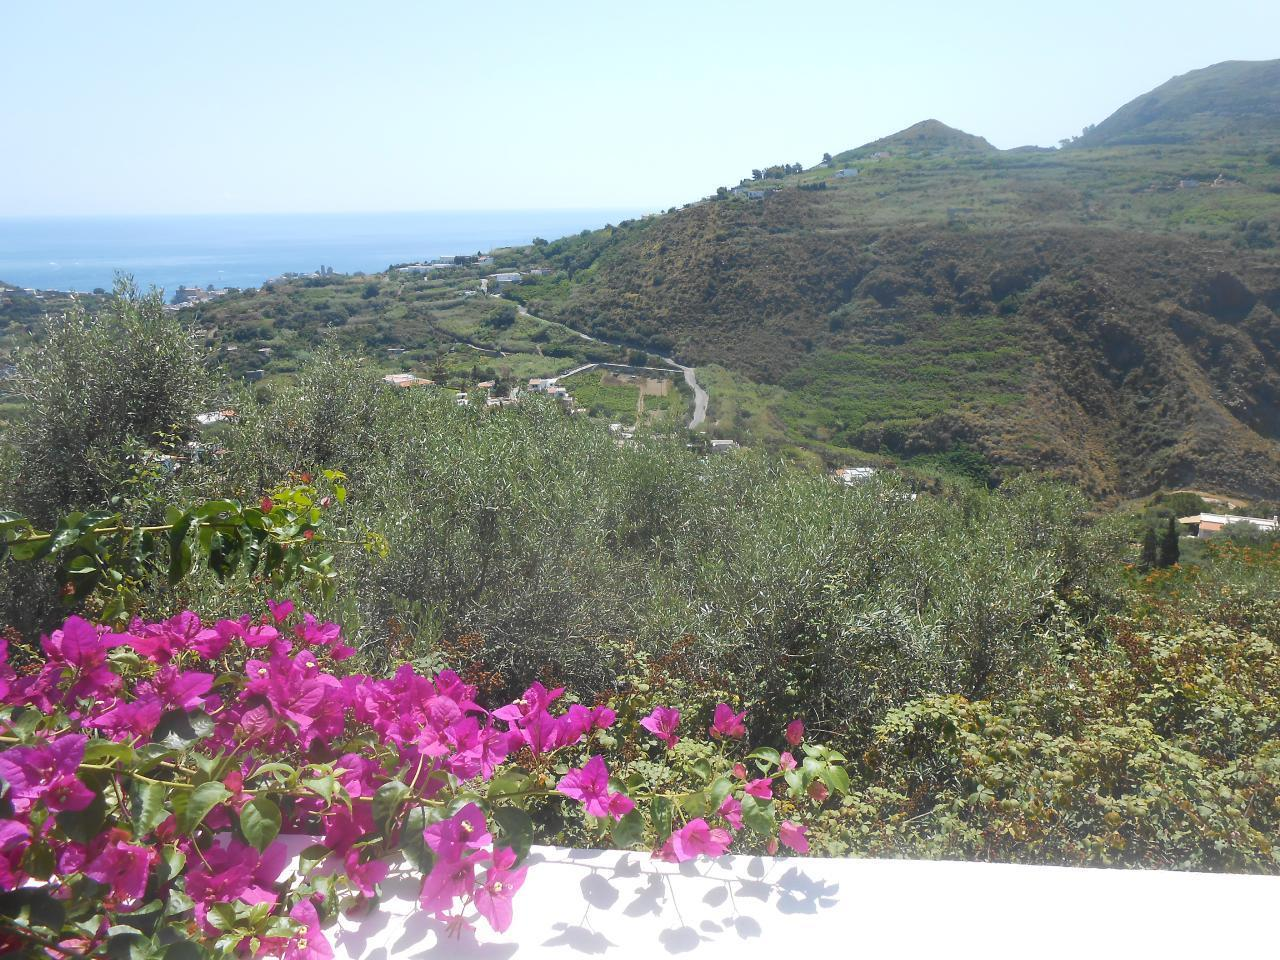 Maison de vacances Ferienhaushälfte Oleandro auf sizilianischer Insel mit atemberaubenden Meeres-Rundblick (2045159), Lipari, Lipari, Sicile, Italie, image 4